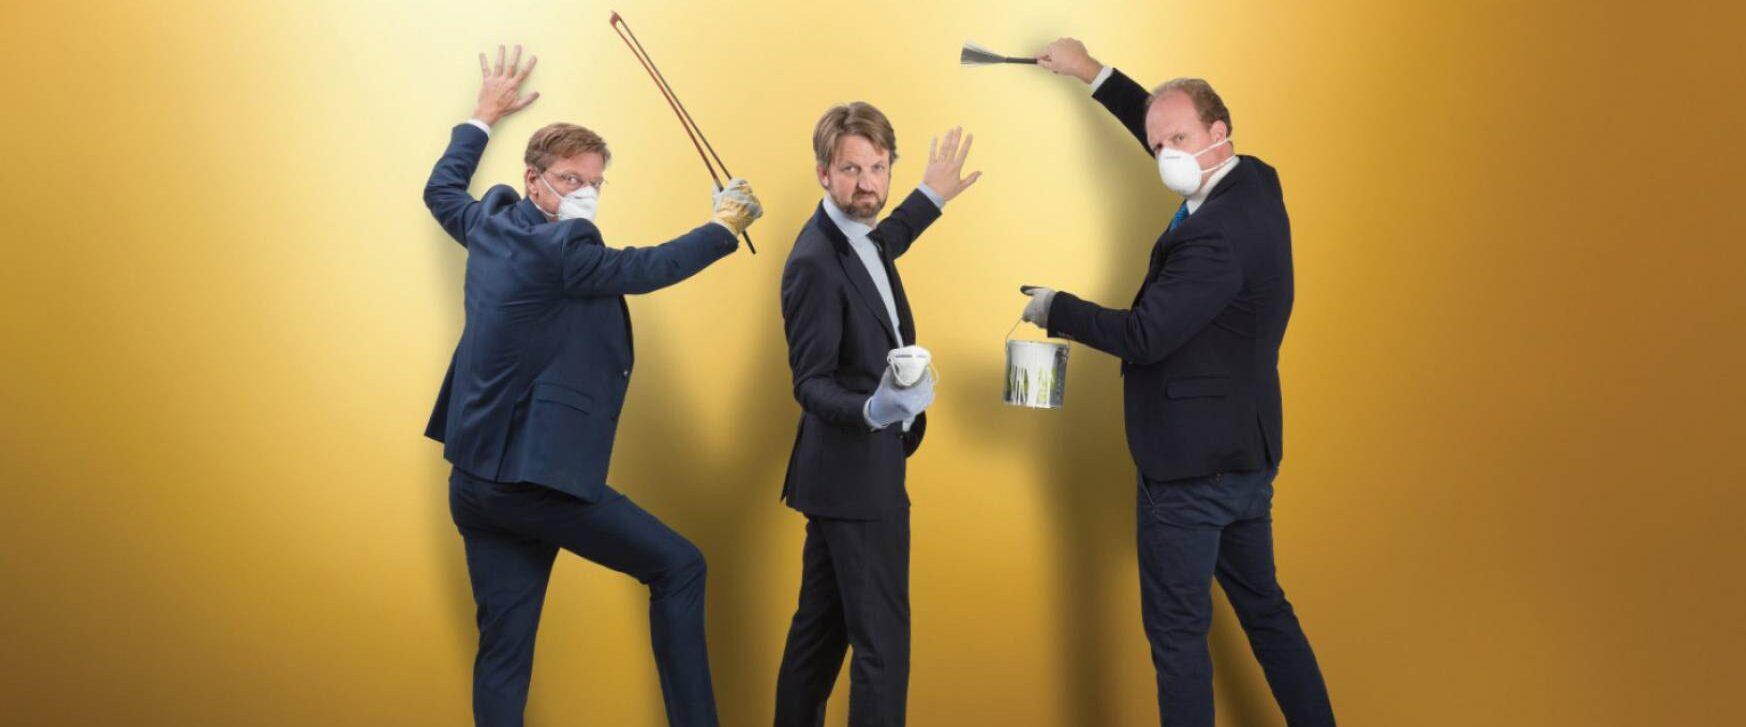 Rembrandt Frerichs Trio 2